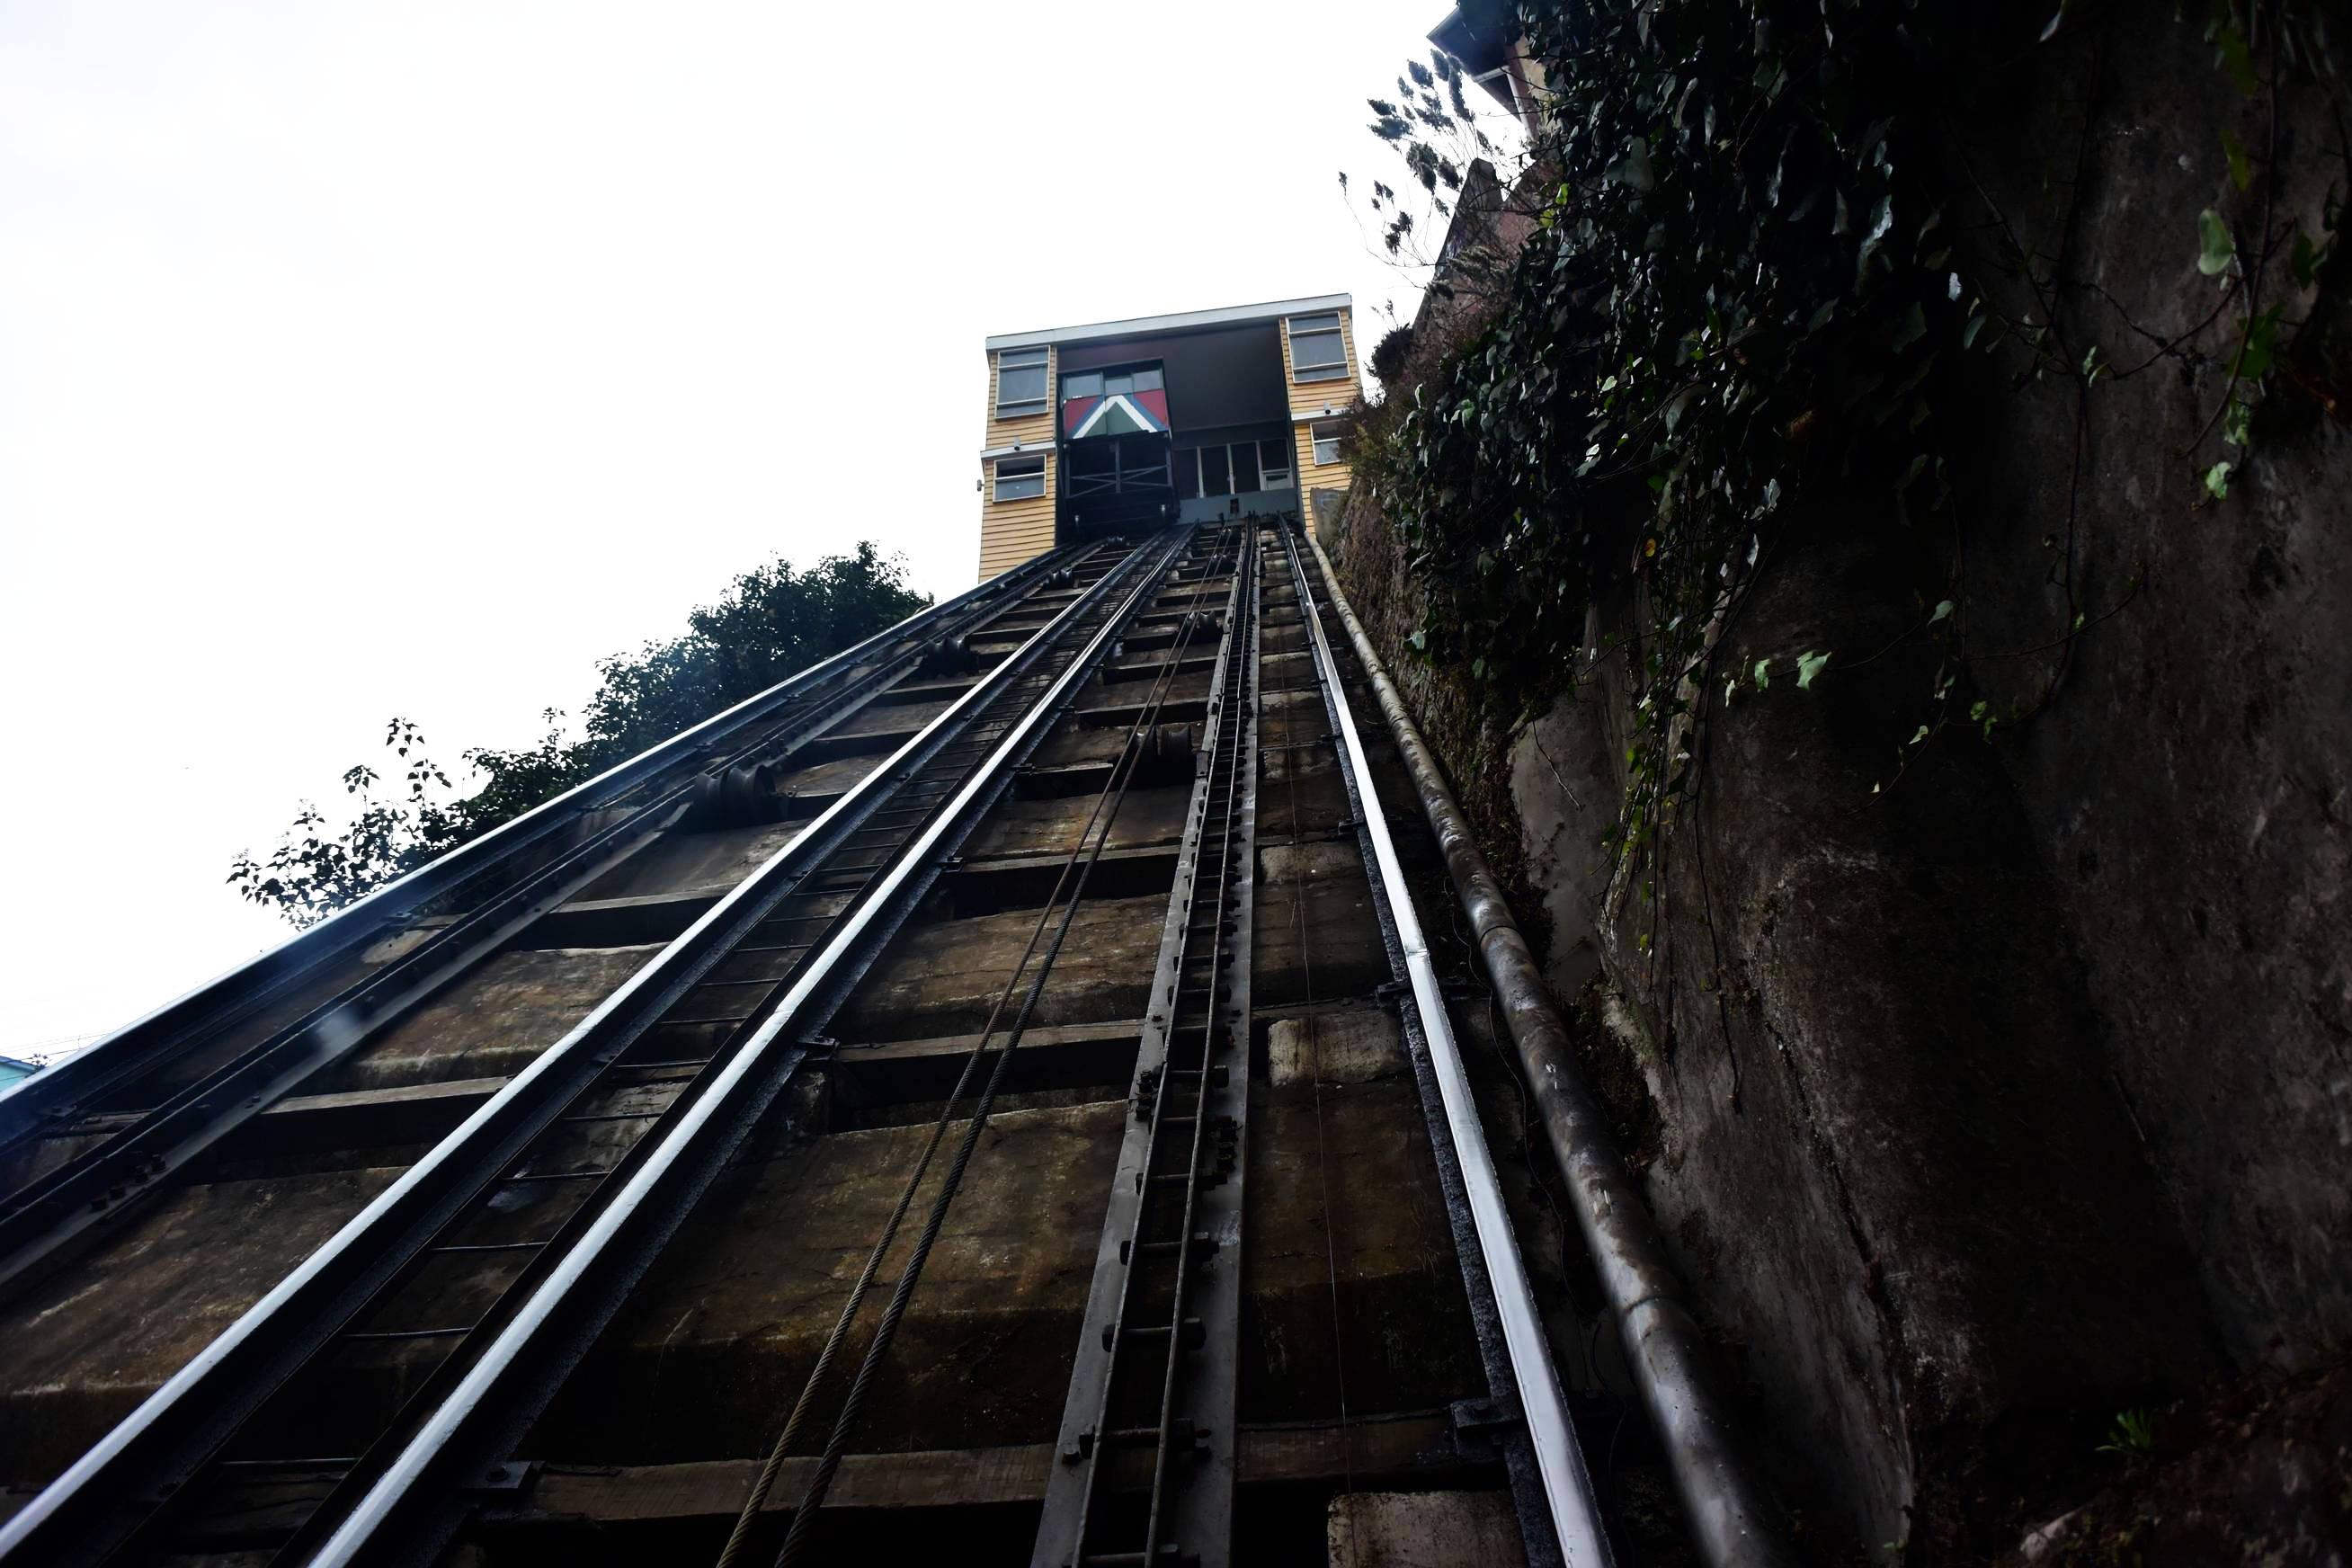 Collines de Valparaiso 6